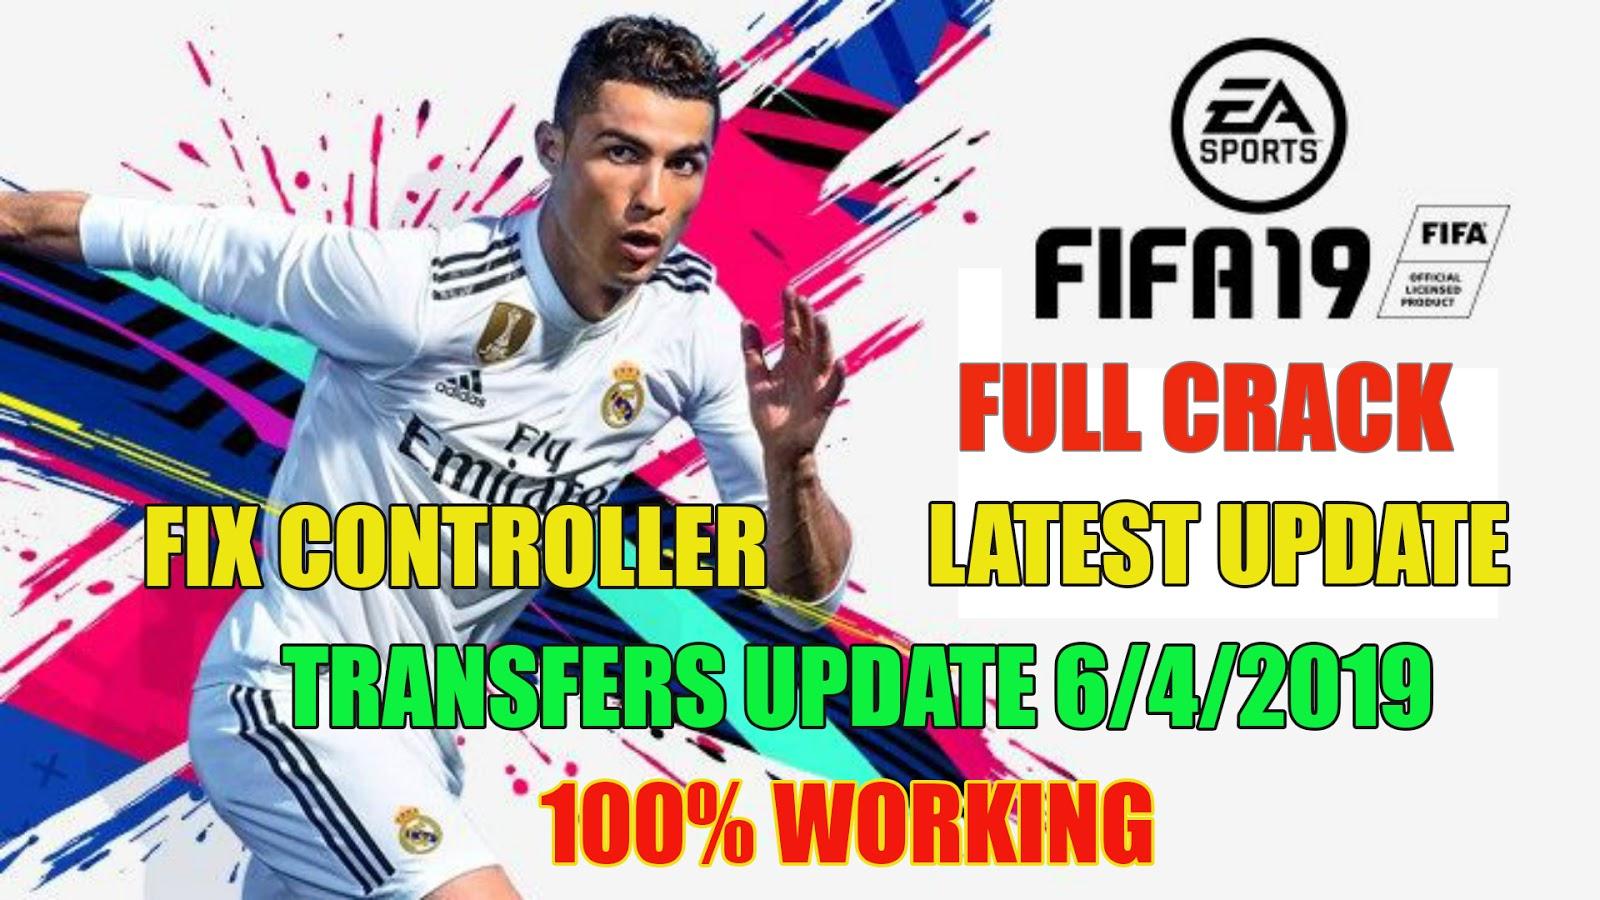 Fifa 19 PC Fix All Errors, Latest Update, Fix Controller, Transfers